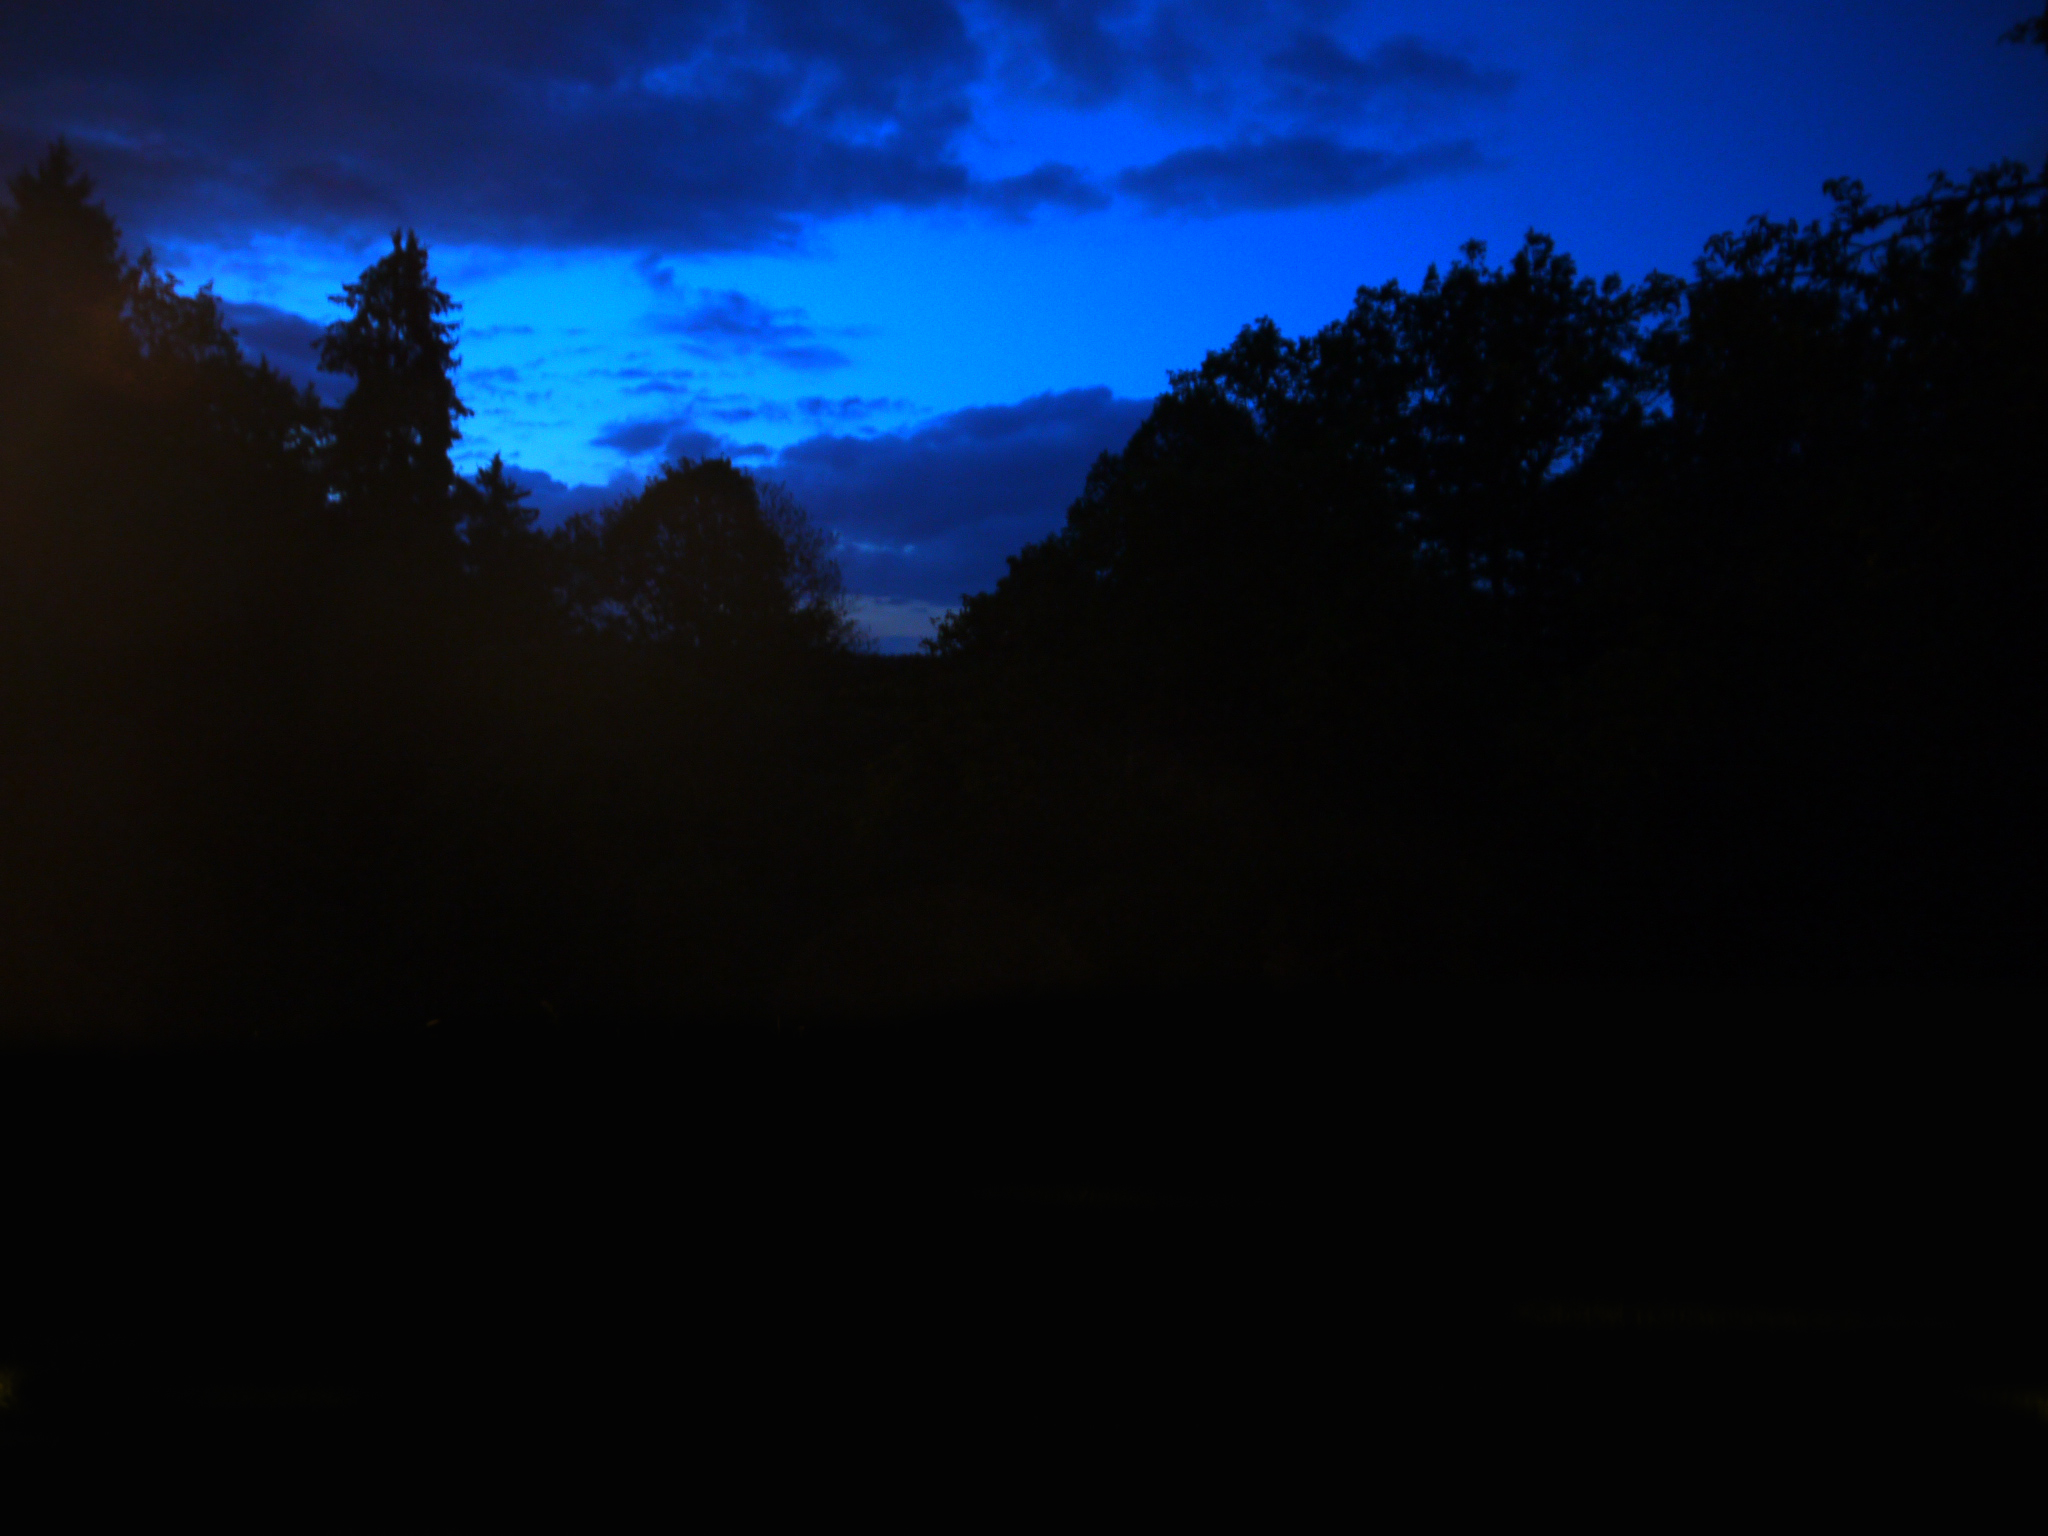 dark blue sky with - photo #41